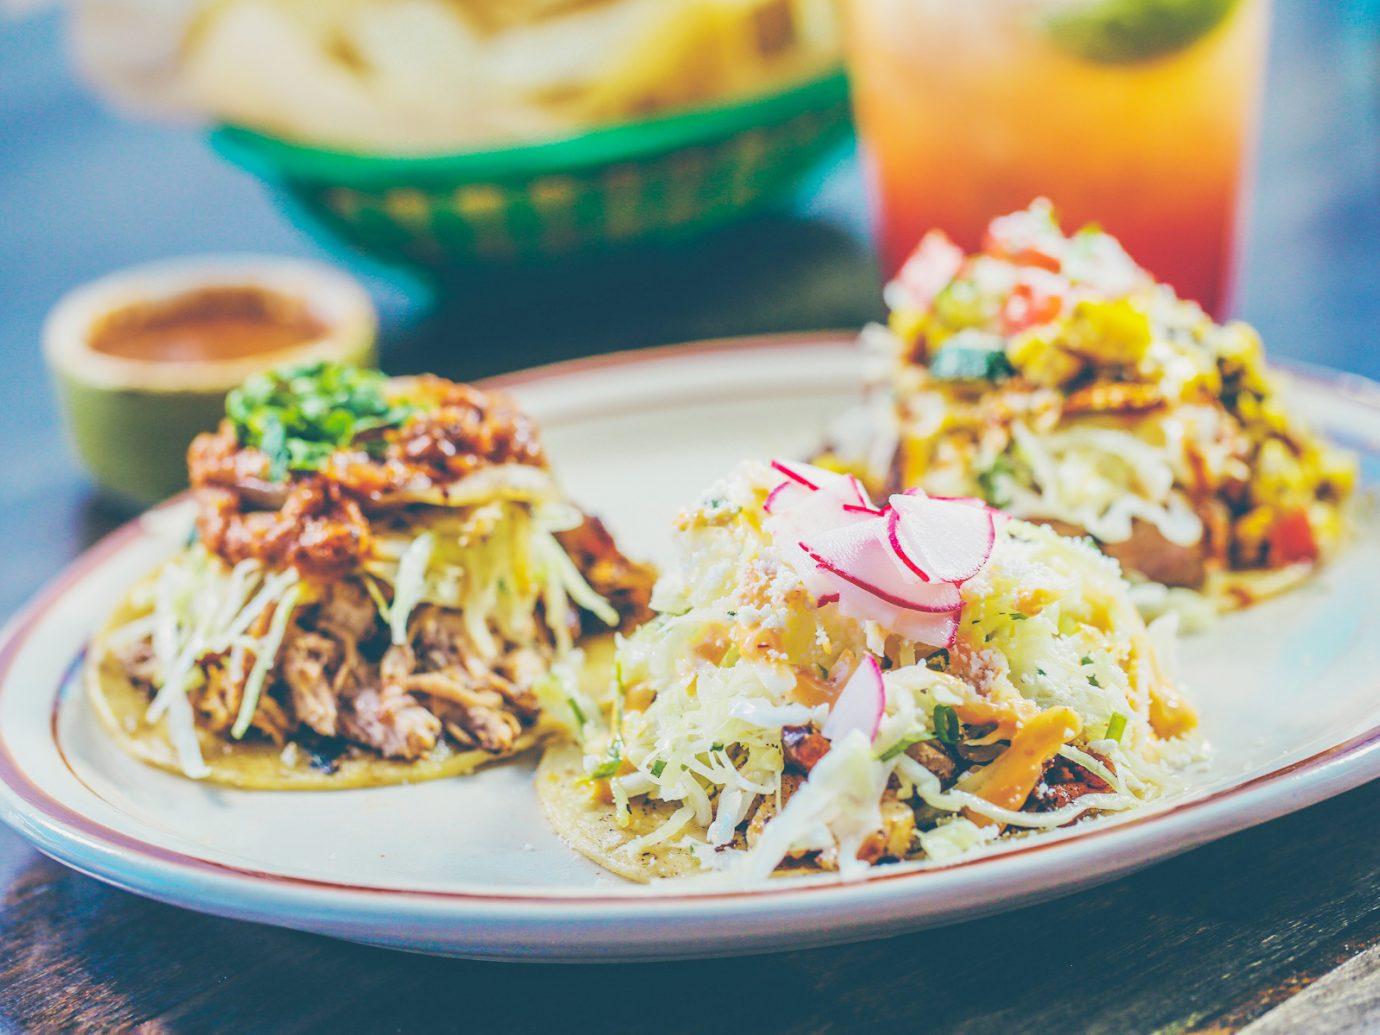 Plate of tacos from Los Chingones in Denver Colorado